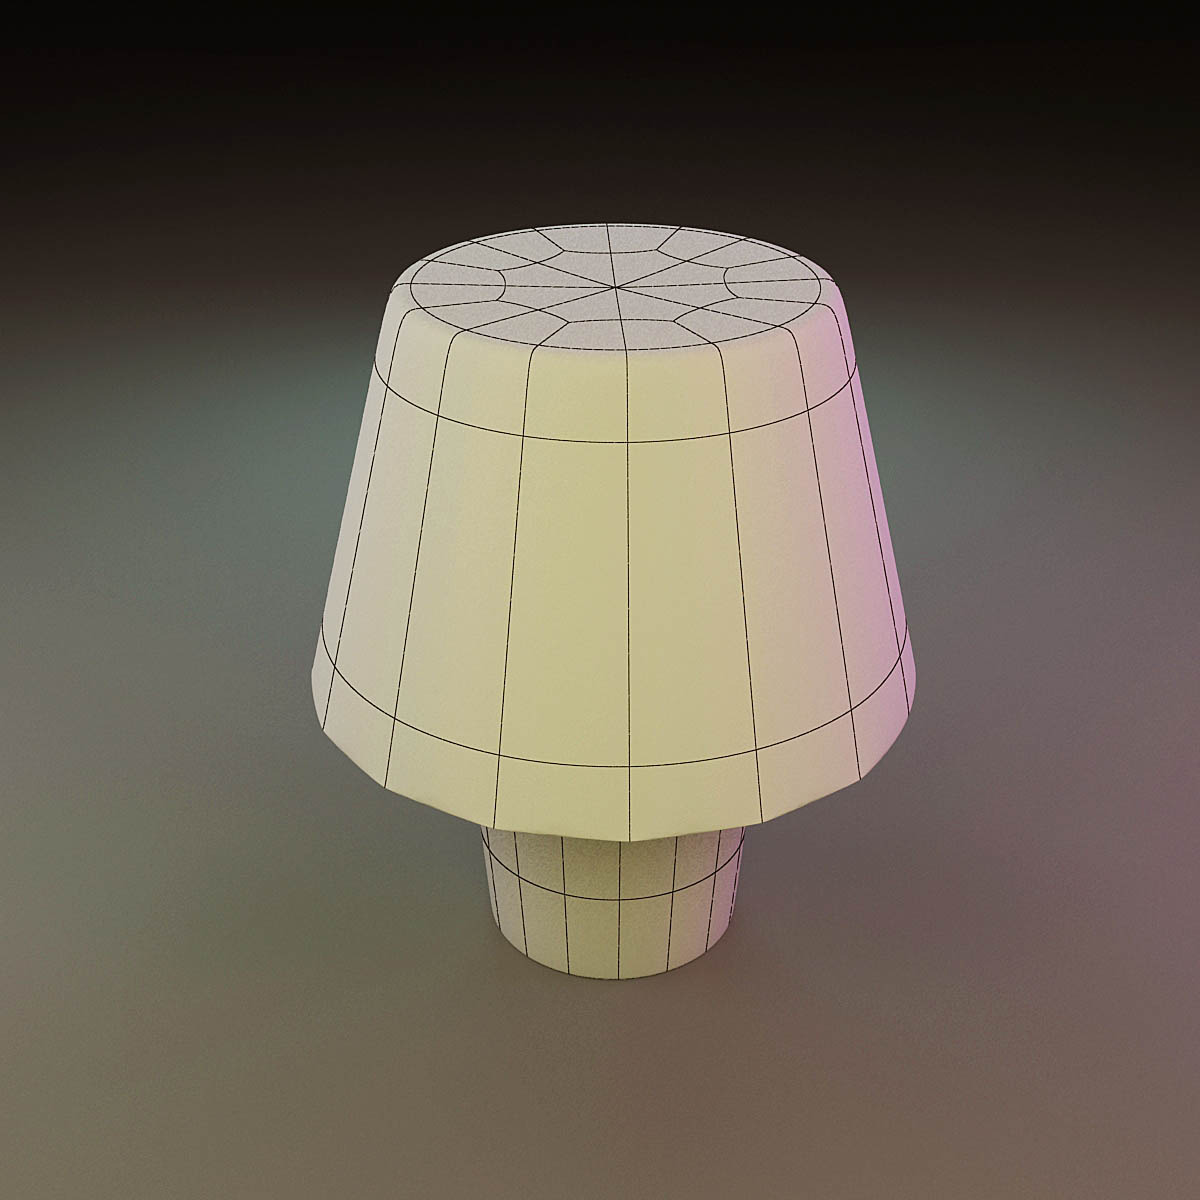 Ikea table lamps 10 in 1 by sercancetin 3docean 2g klabbg lampan 2g lampang naturel 2g naturelg stockholm 2g stockholmg vate 2g vateg vidja 2g vidjag geotapseo Image collections